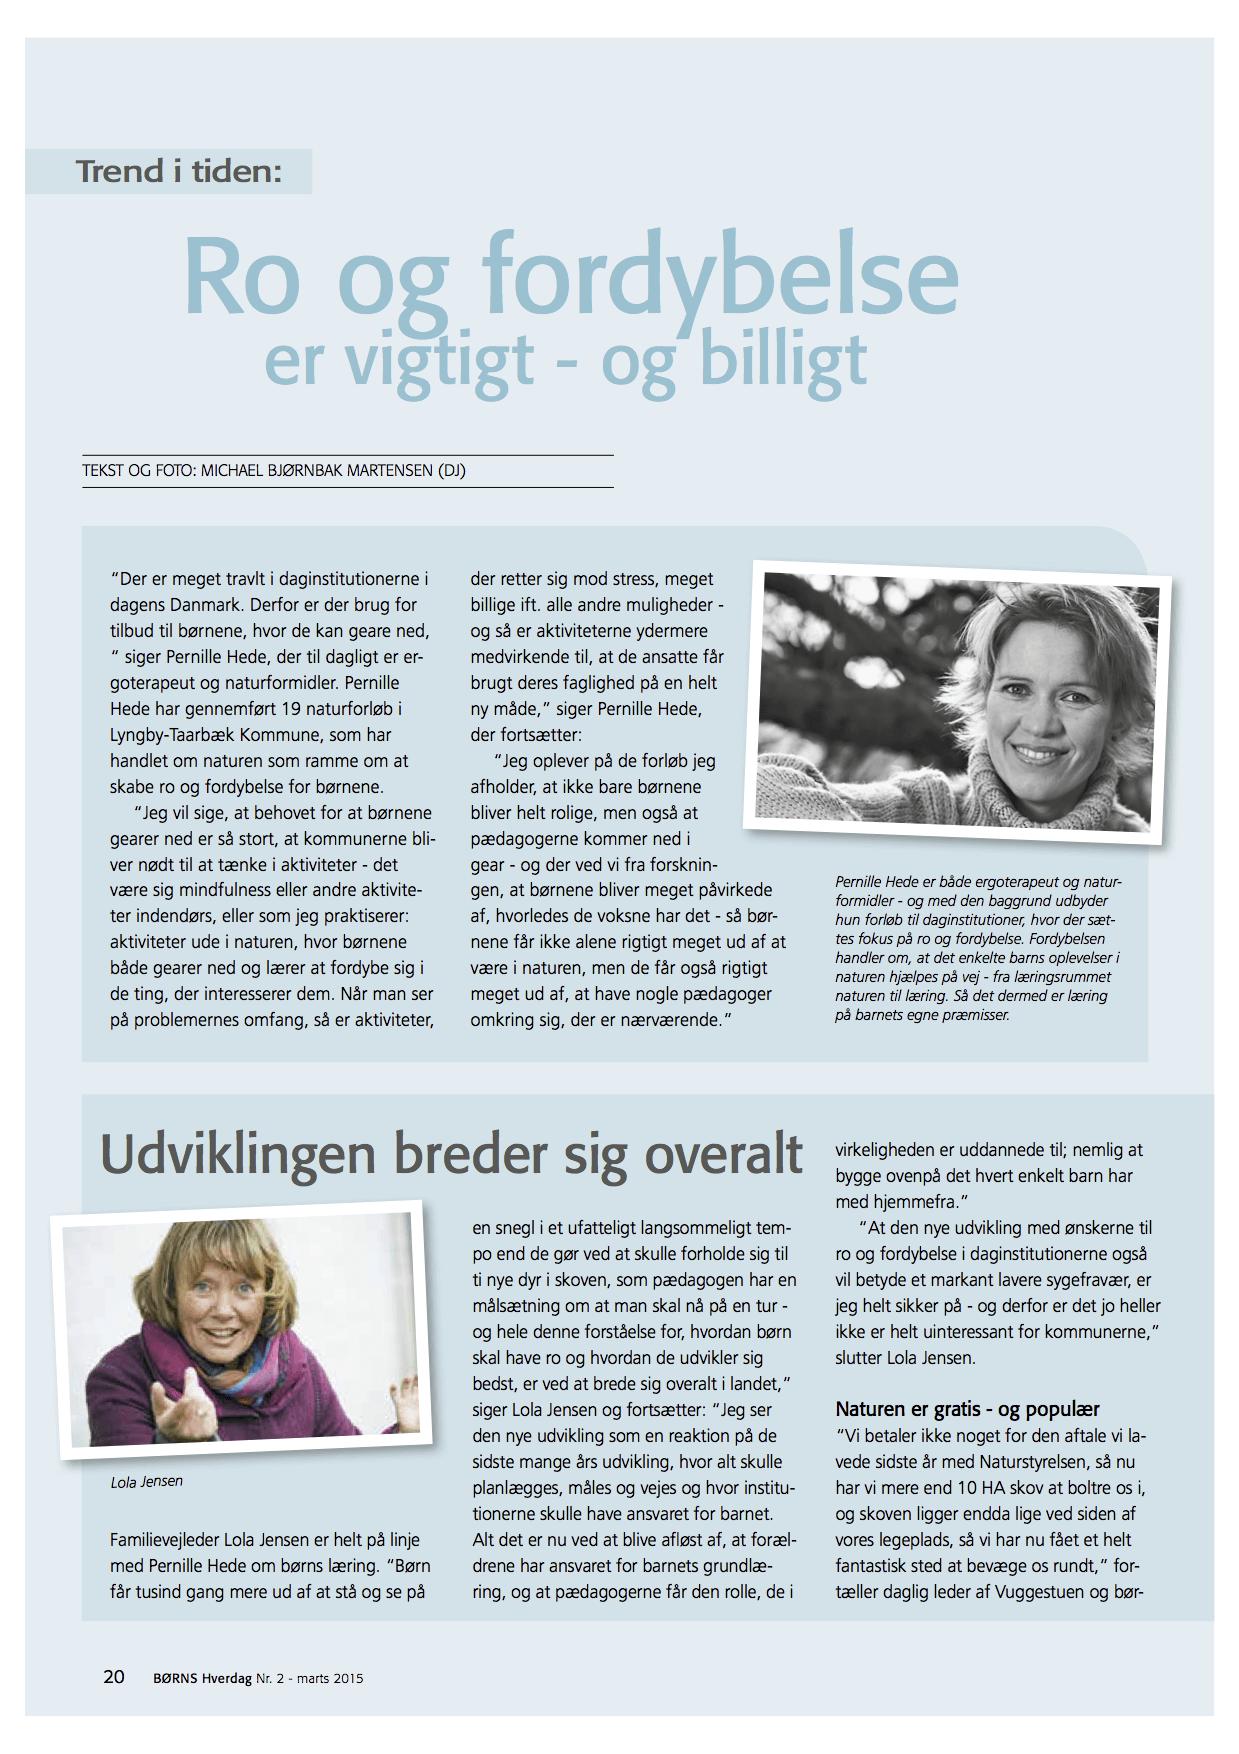 S20 Borns hverdag3 2015.pdf